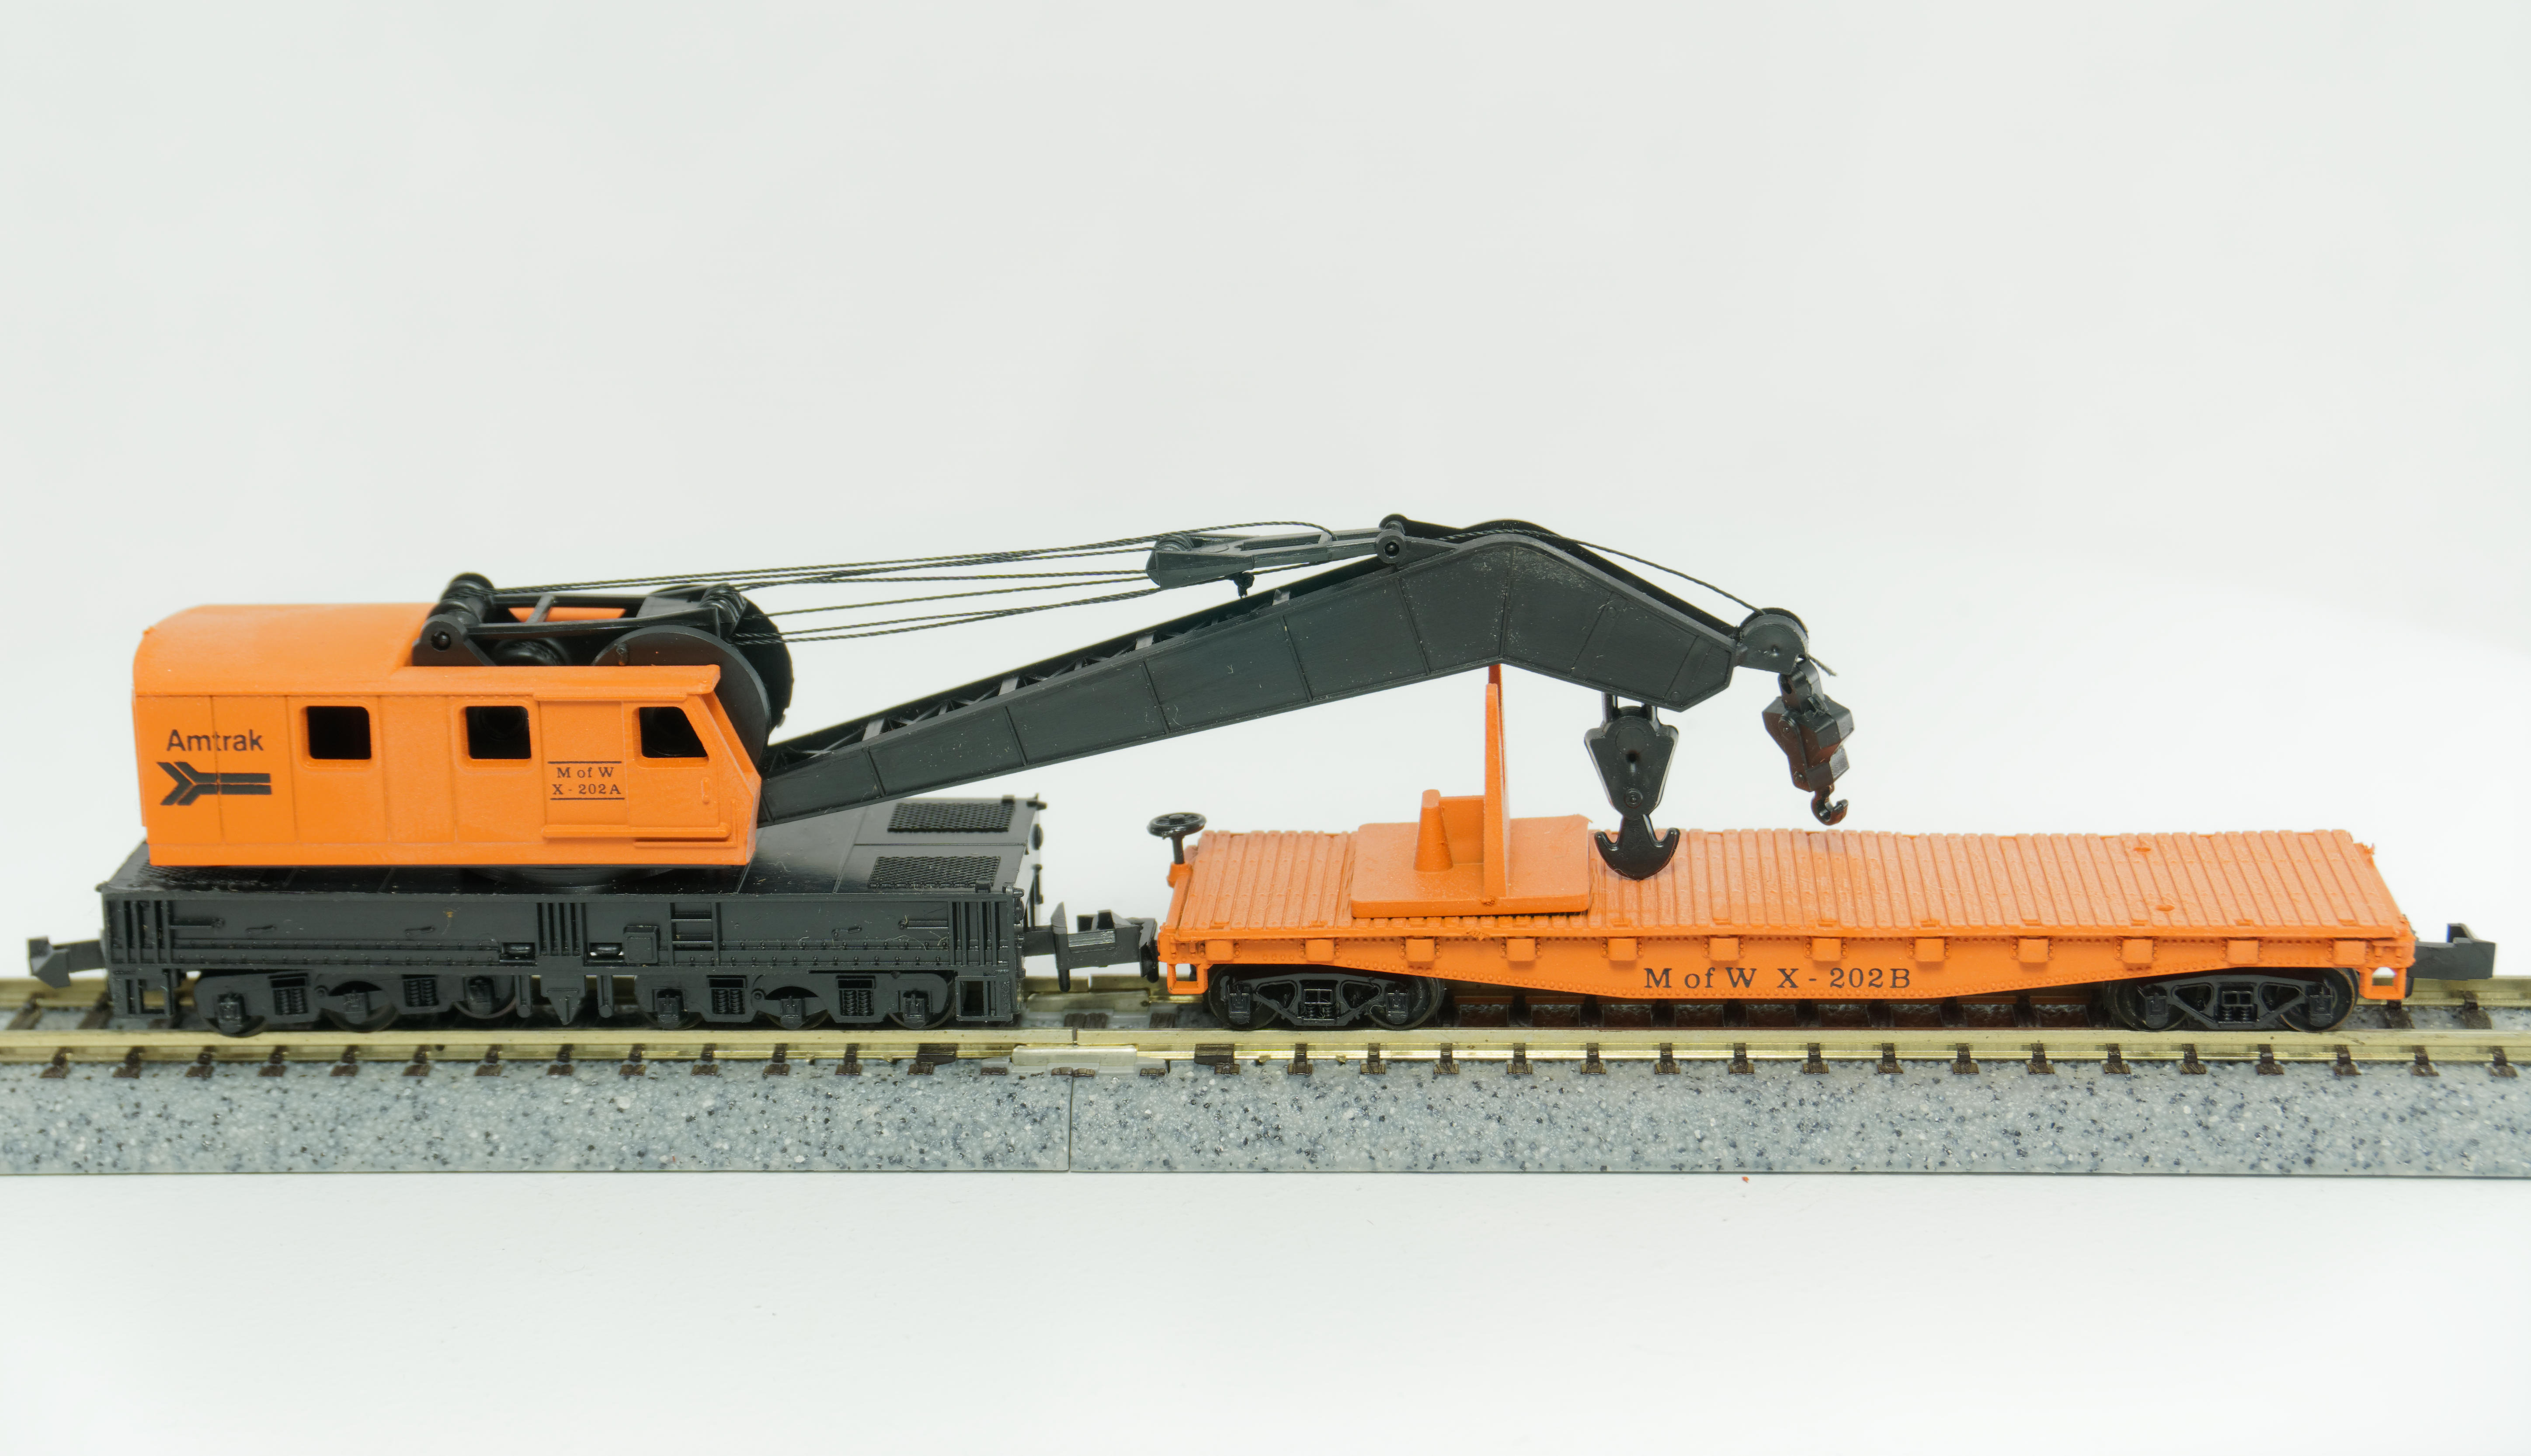 N Scale - Con-Cor - 0001-6020XX - Maintenance of Way, Wrecking Crane, North America - Amtrak - X-202A & B